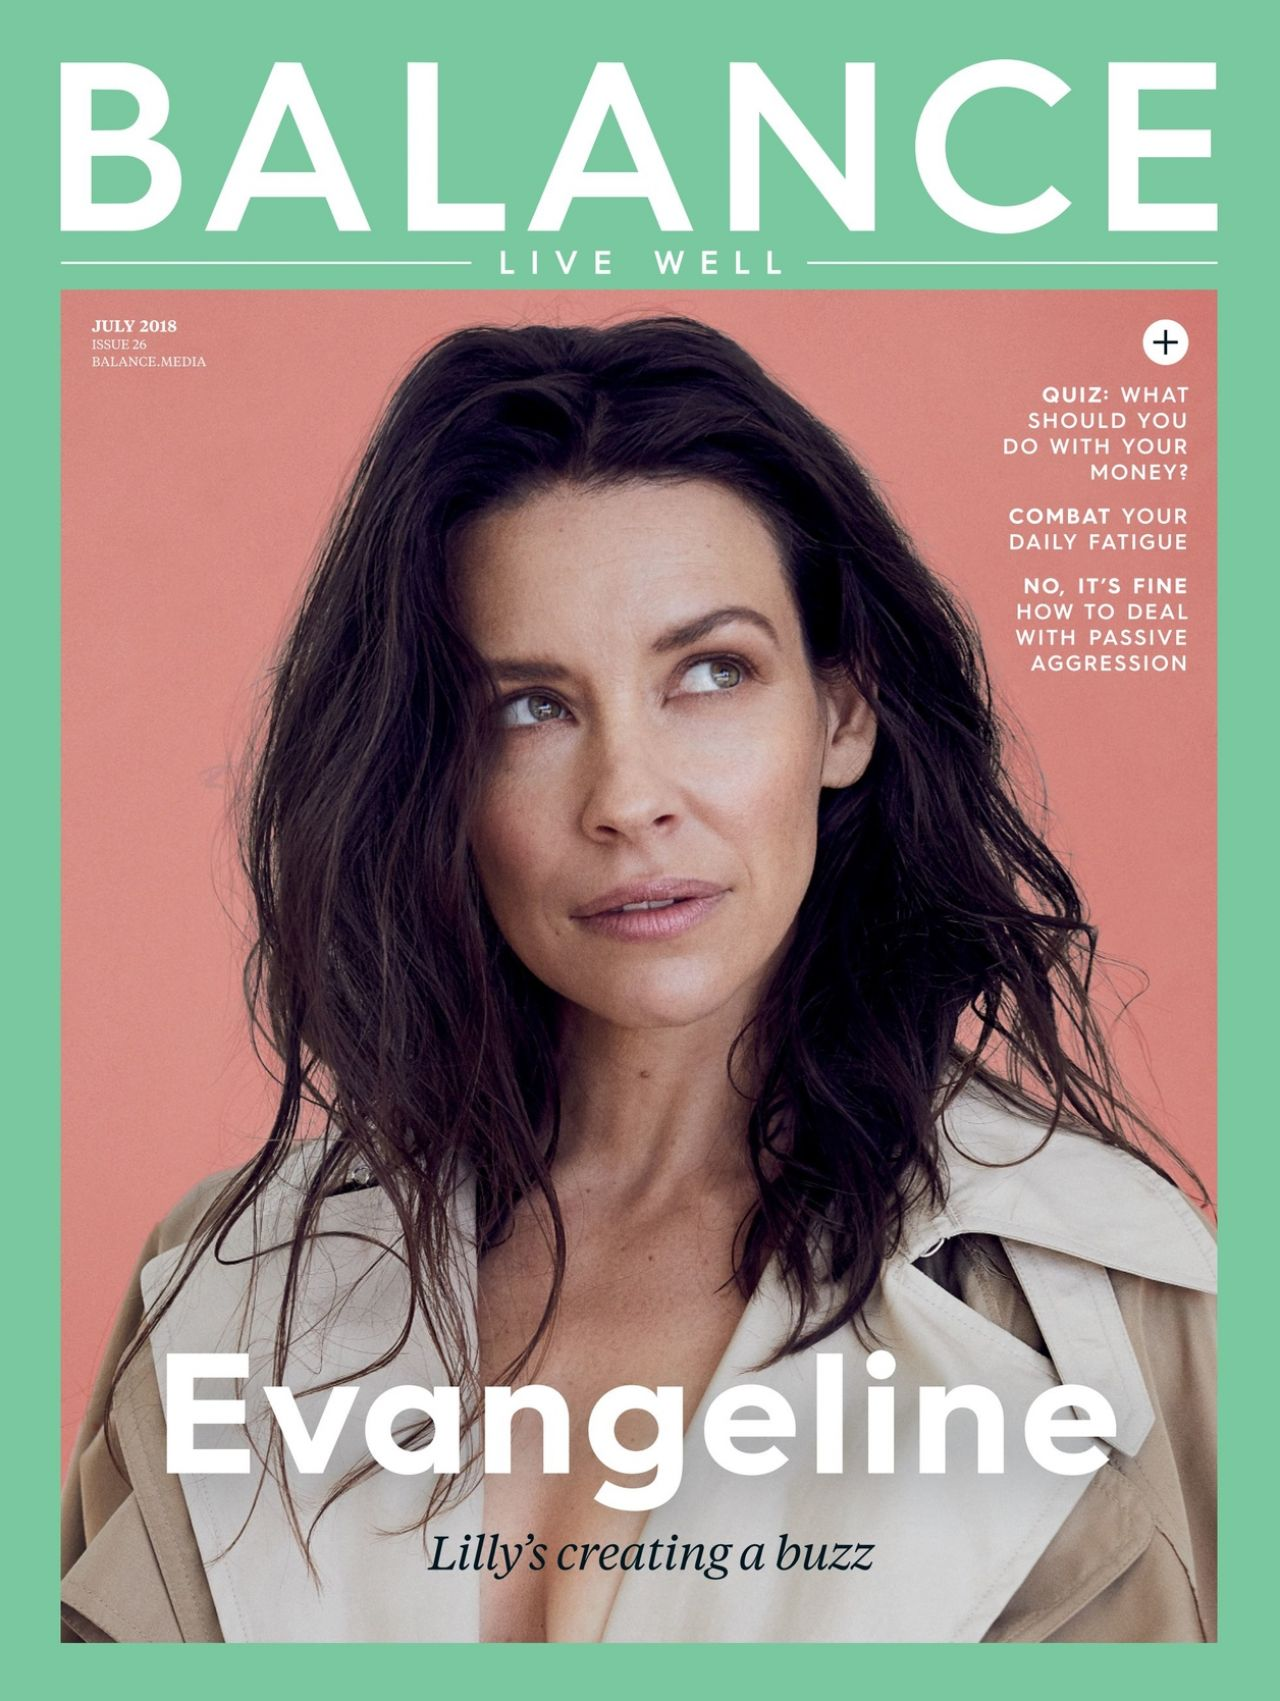 https://celebmafia.com/wp-content/uploads/2018/07/evangeline-lilly-balance-magazine-july-2018-issue-2.jpg